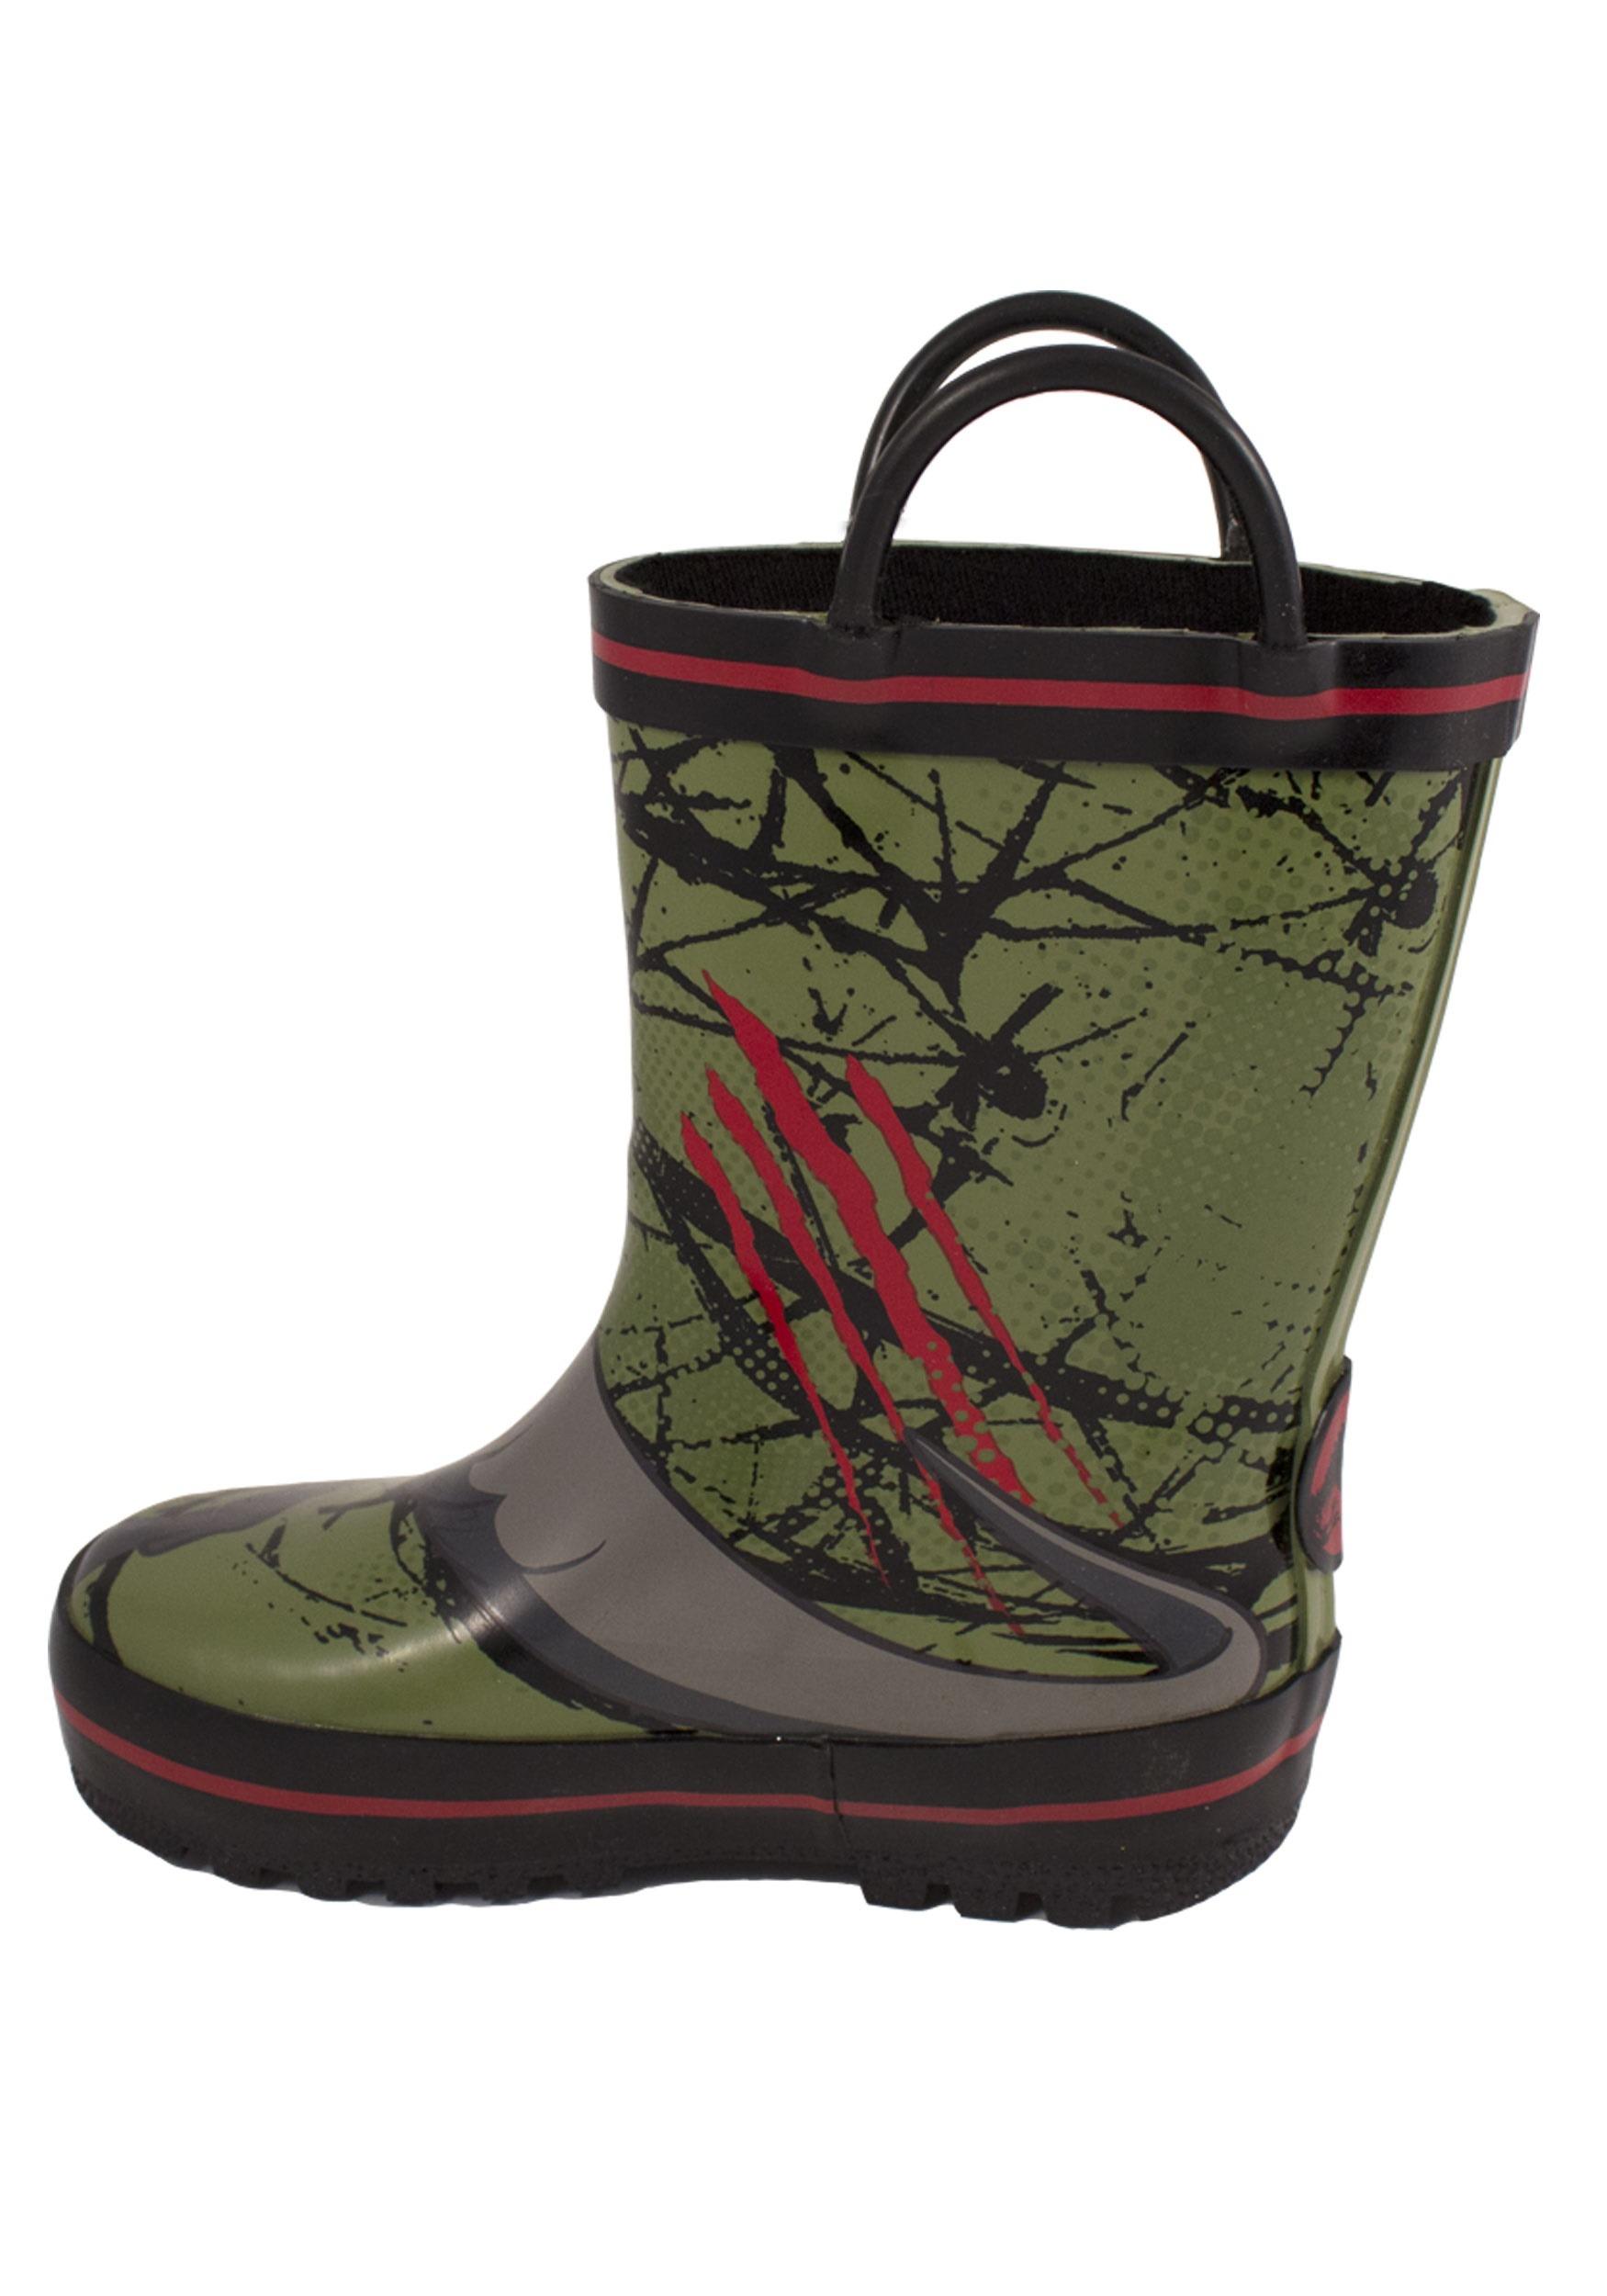 Kids Jurassic World Rainboots